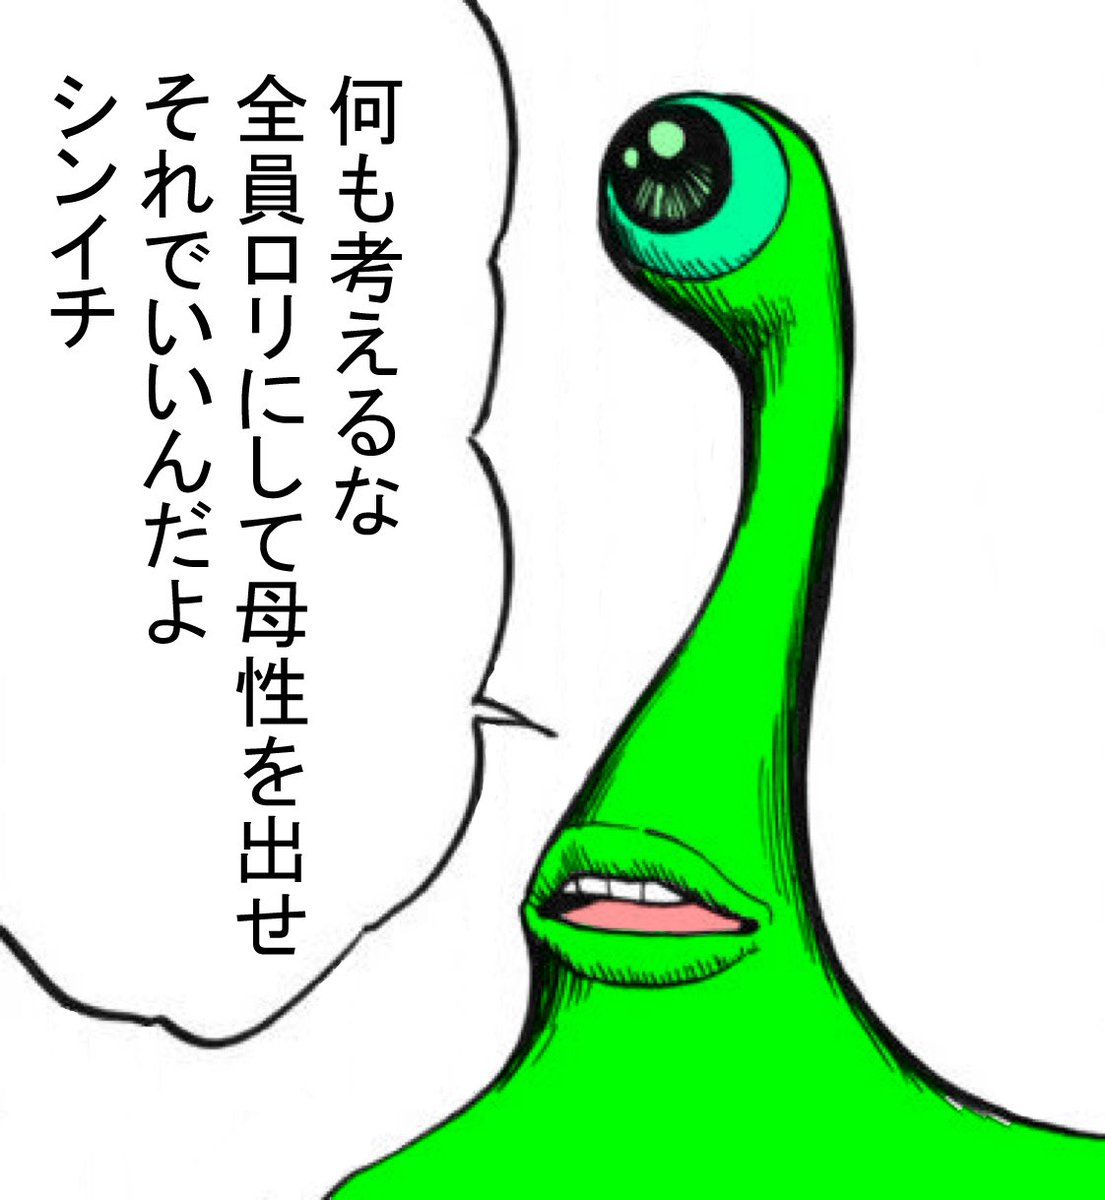 Midorimame の画像動画一覧 Whotwi グラフィカルtwitter分析